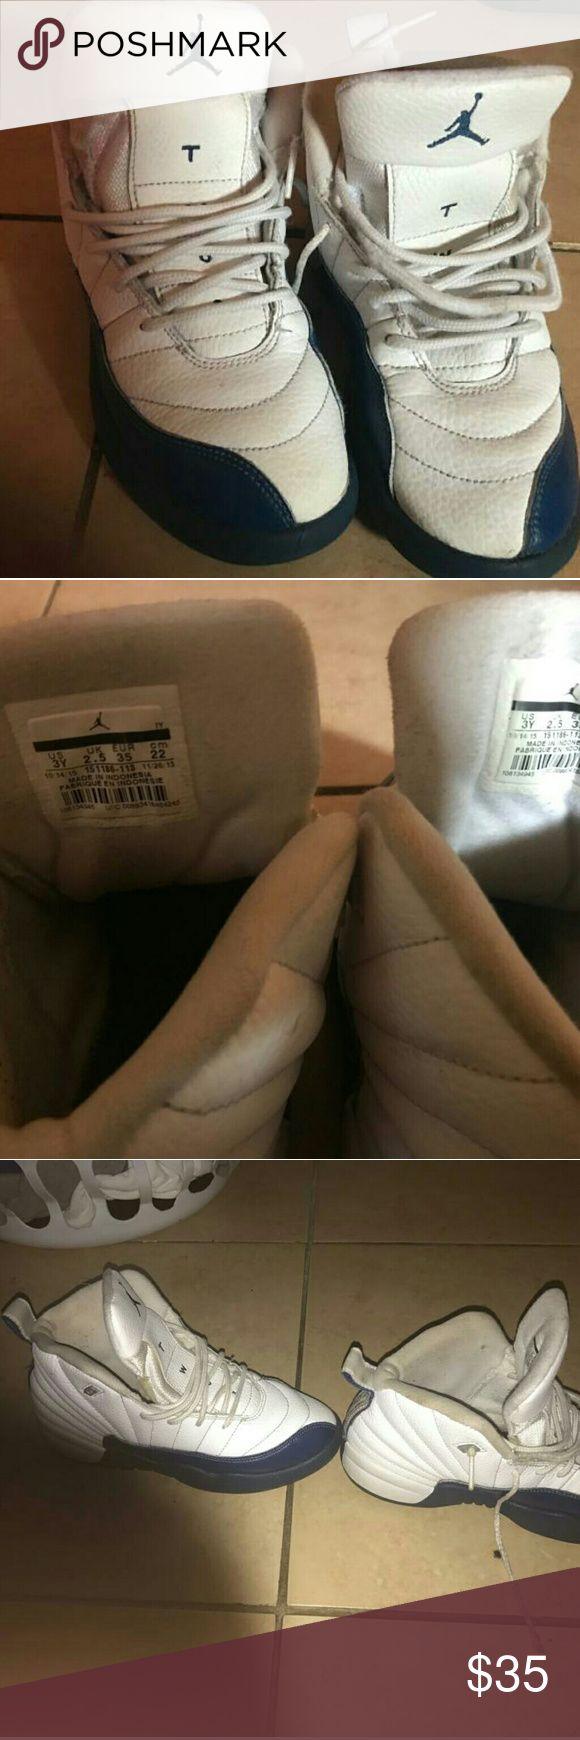 Kids Jordan Jordan retro 12 shoe ok condition bundles are welcome. Feel free to make a offer Jordan Shoes Sneakers